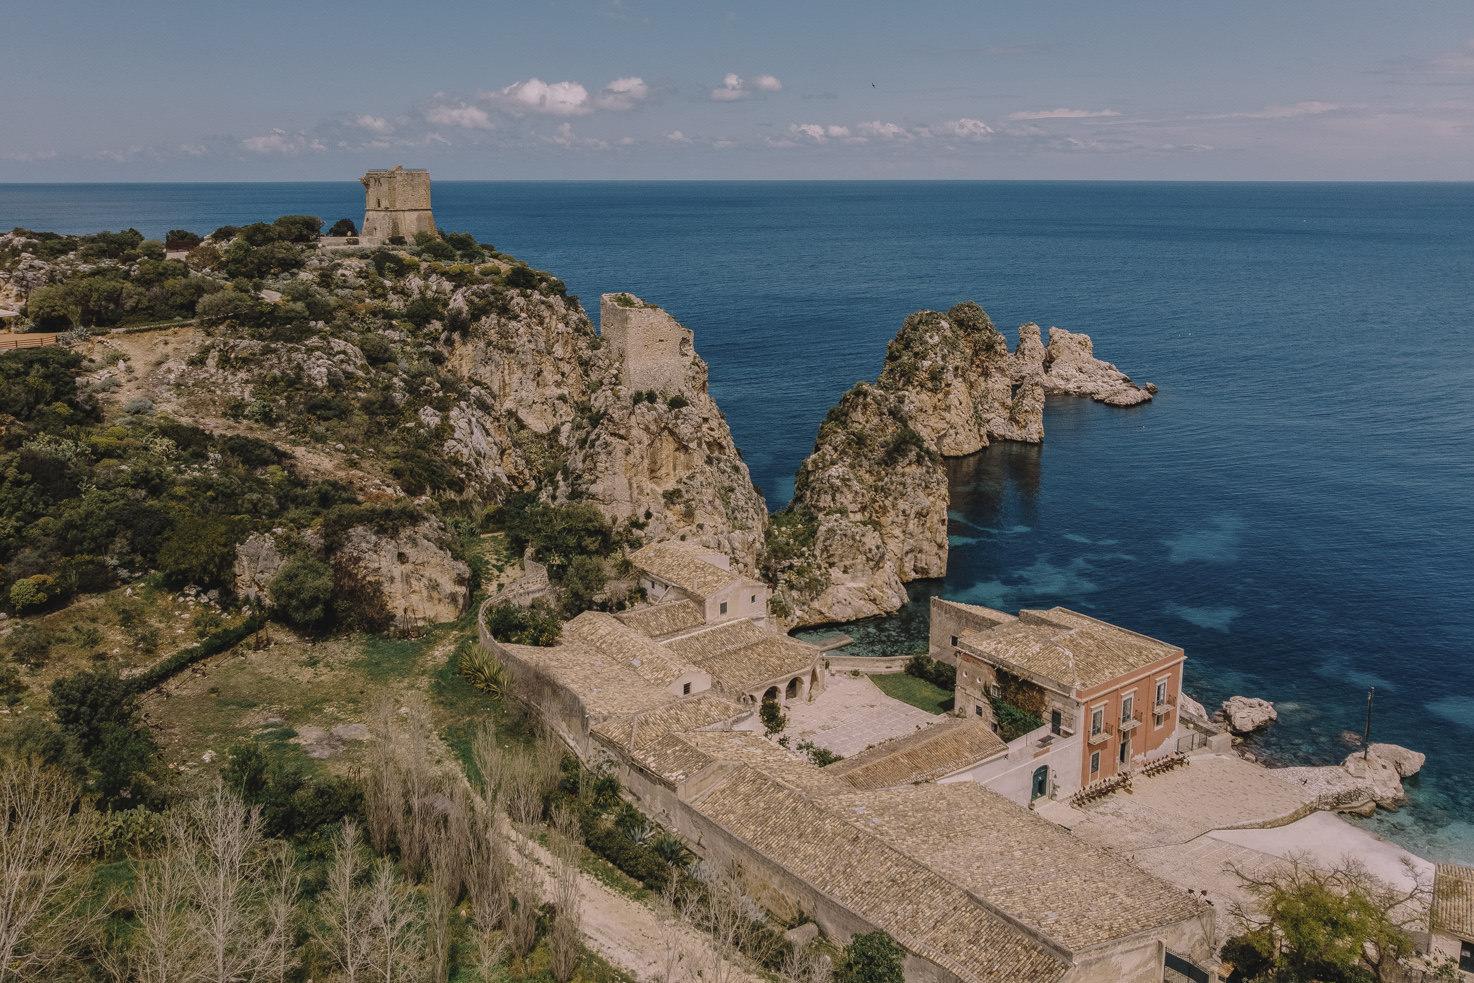 Panoramic view of Tonnara di Scopello